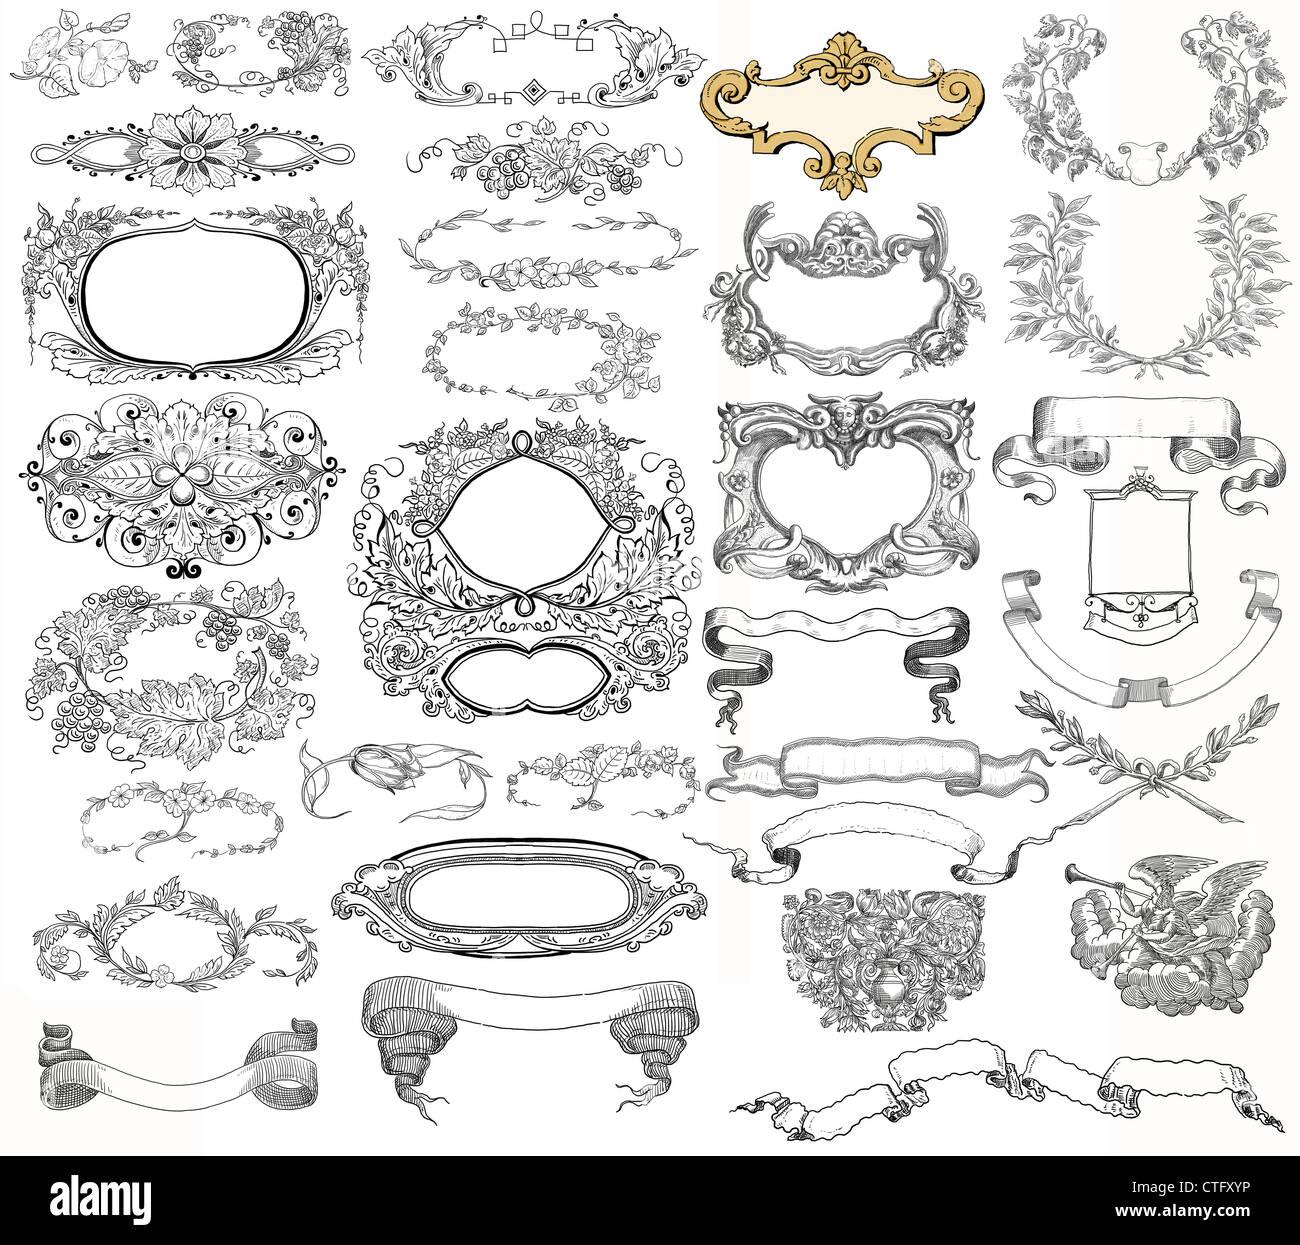 Cartouche set illustration Stock Photo: 49522922 - Alamy